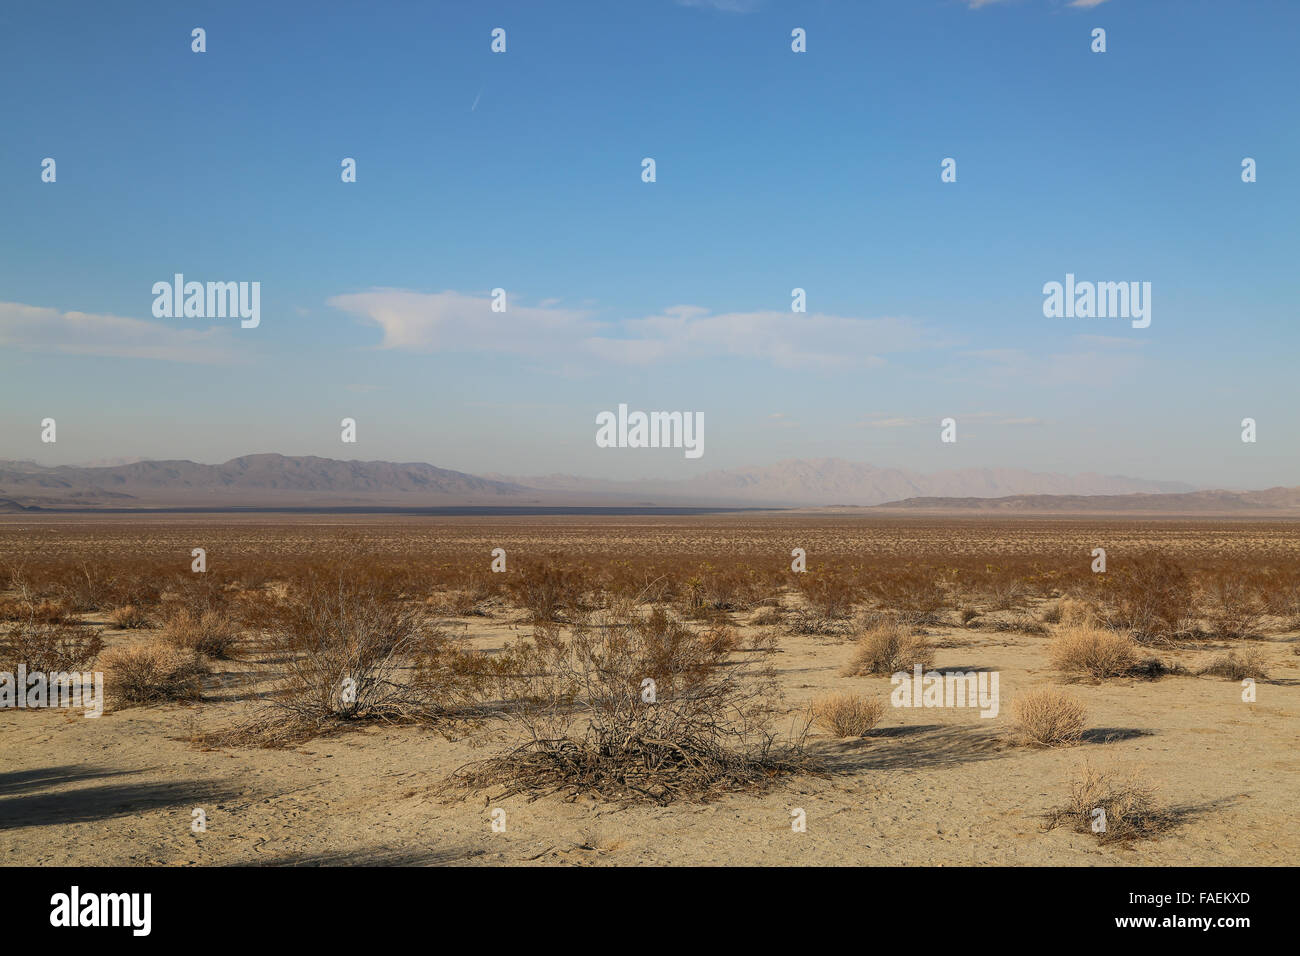 Brush and dry desert in Joshua Tree National Park, California. - Stock Image